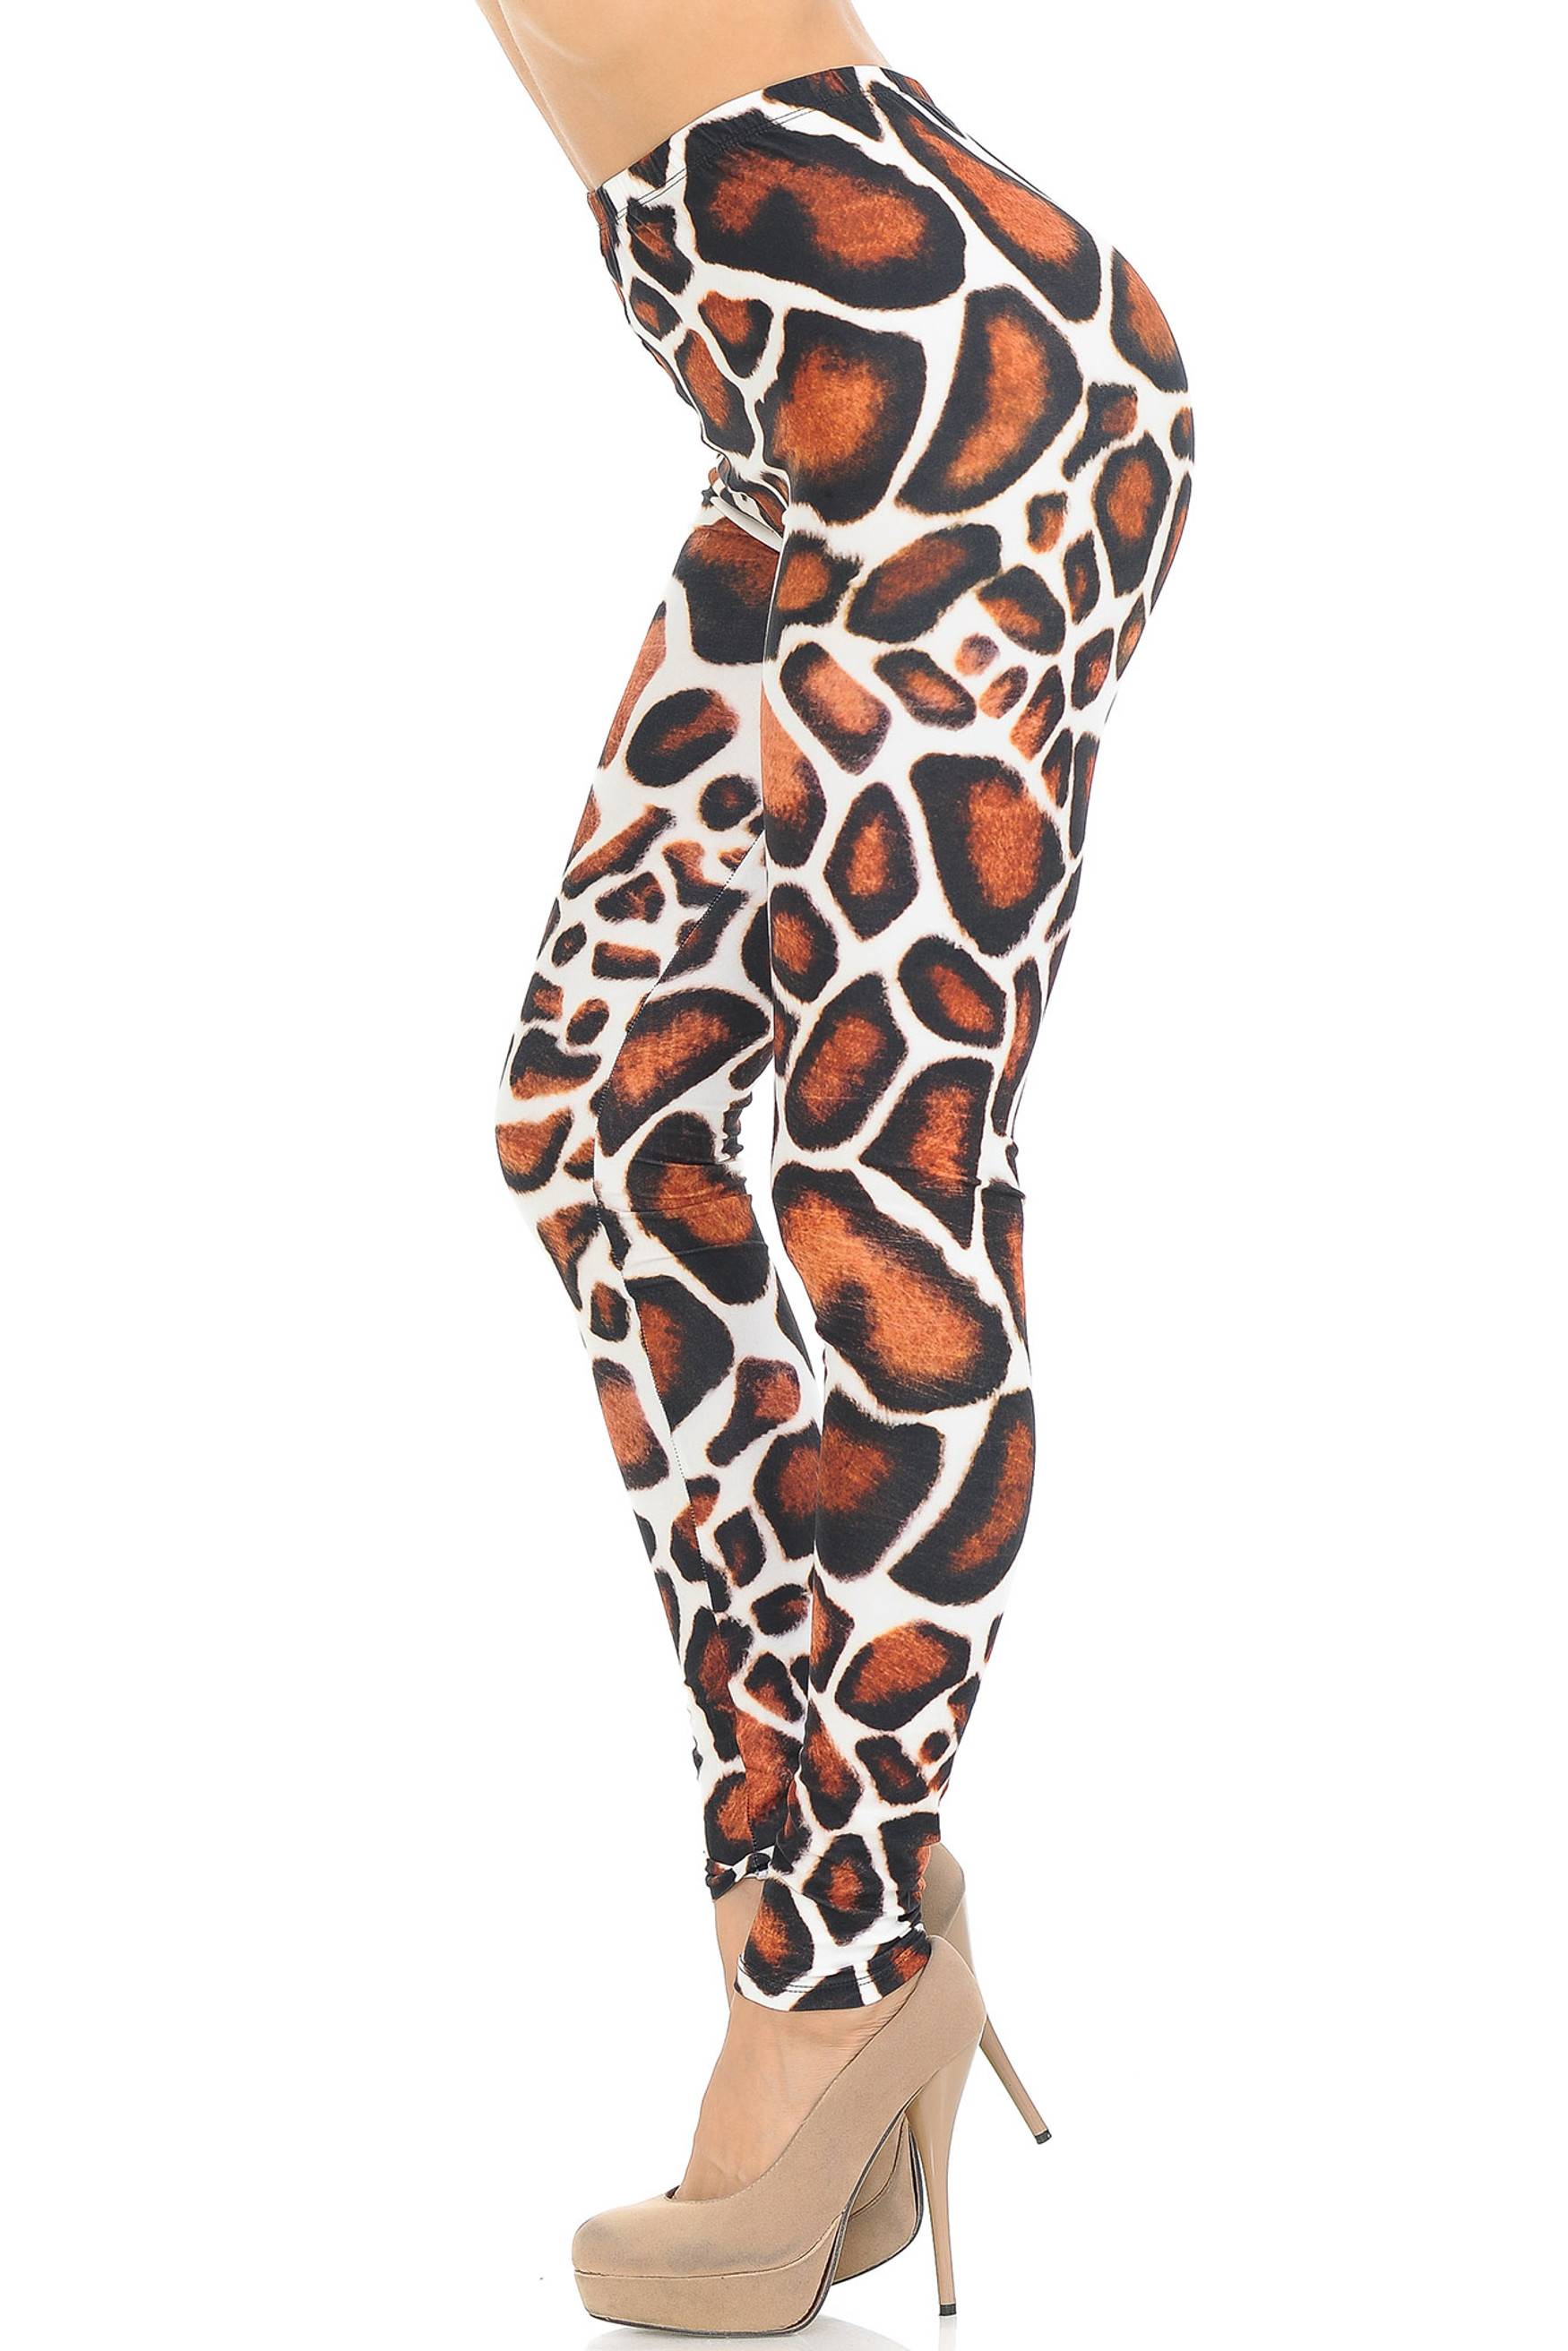 Creamy Soft Giraffe Print Extra Small Leggings - USA Fashion™